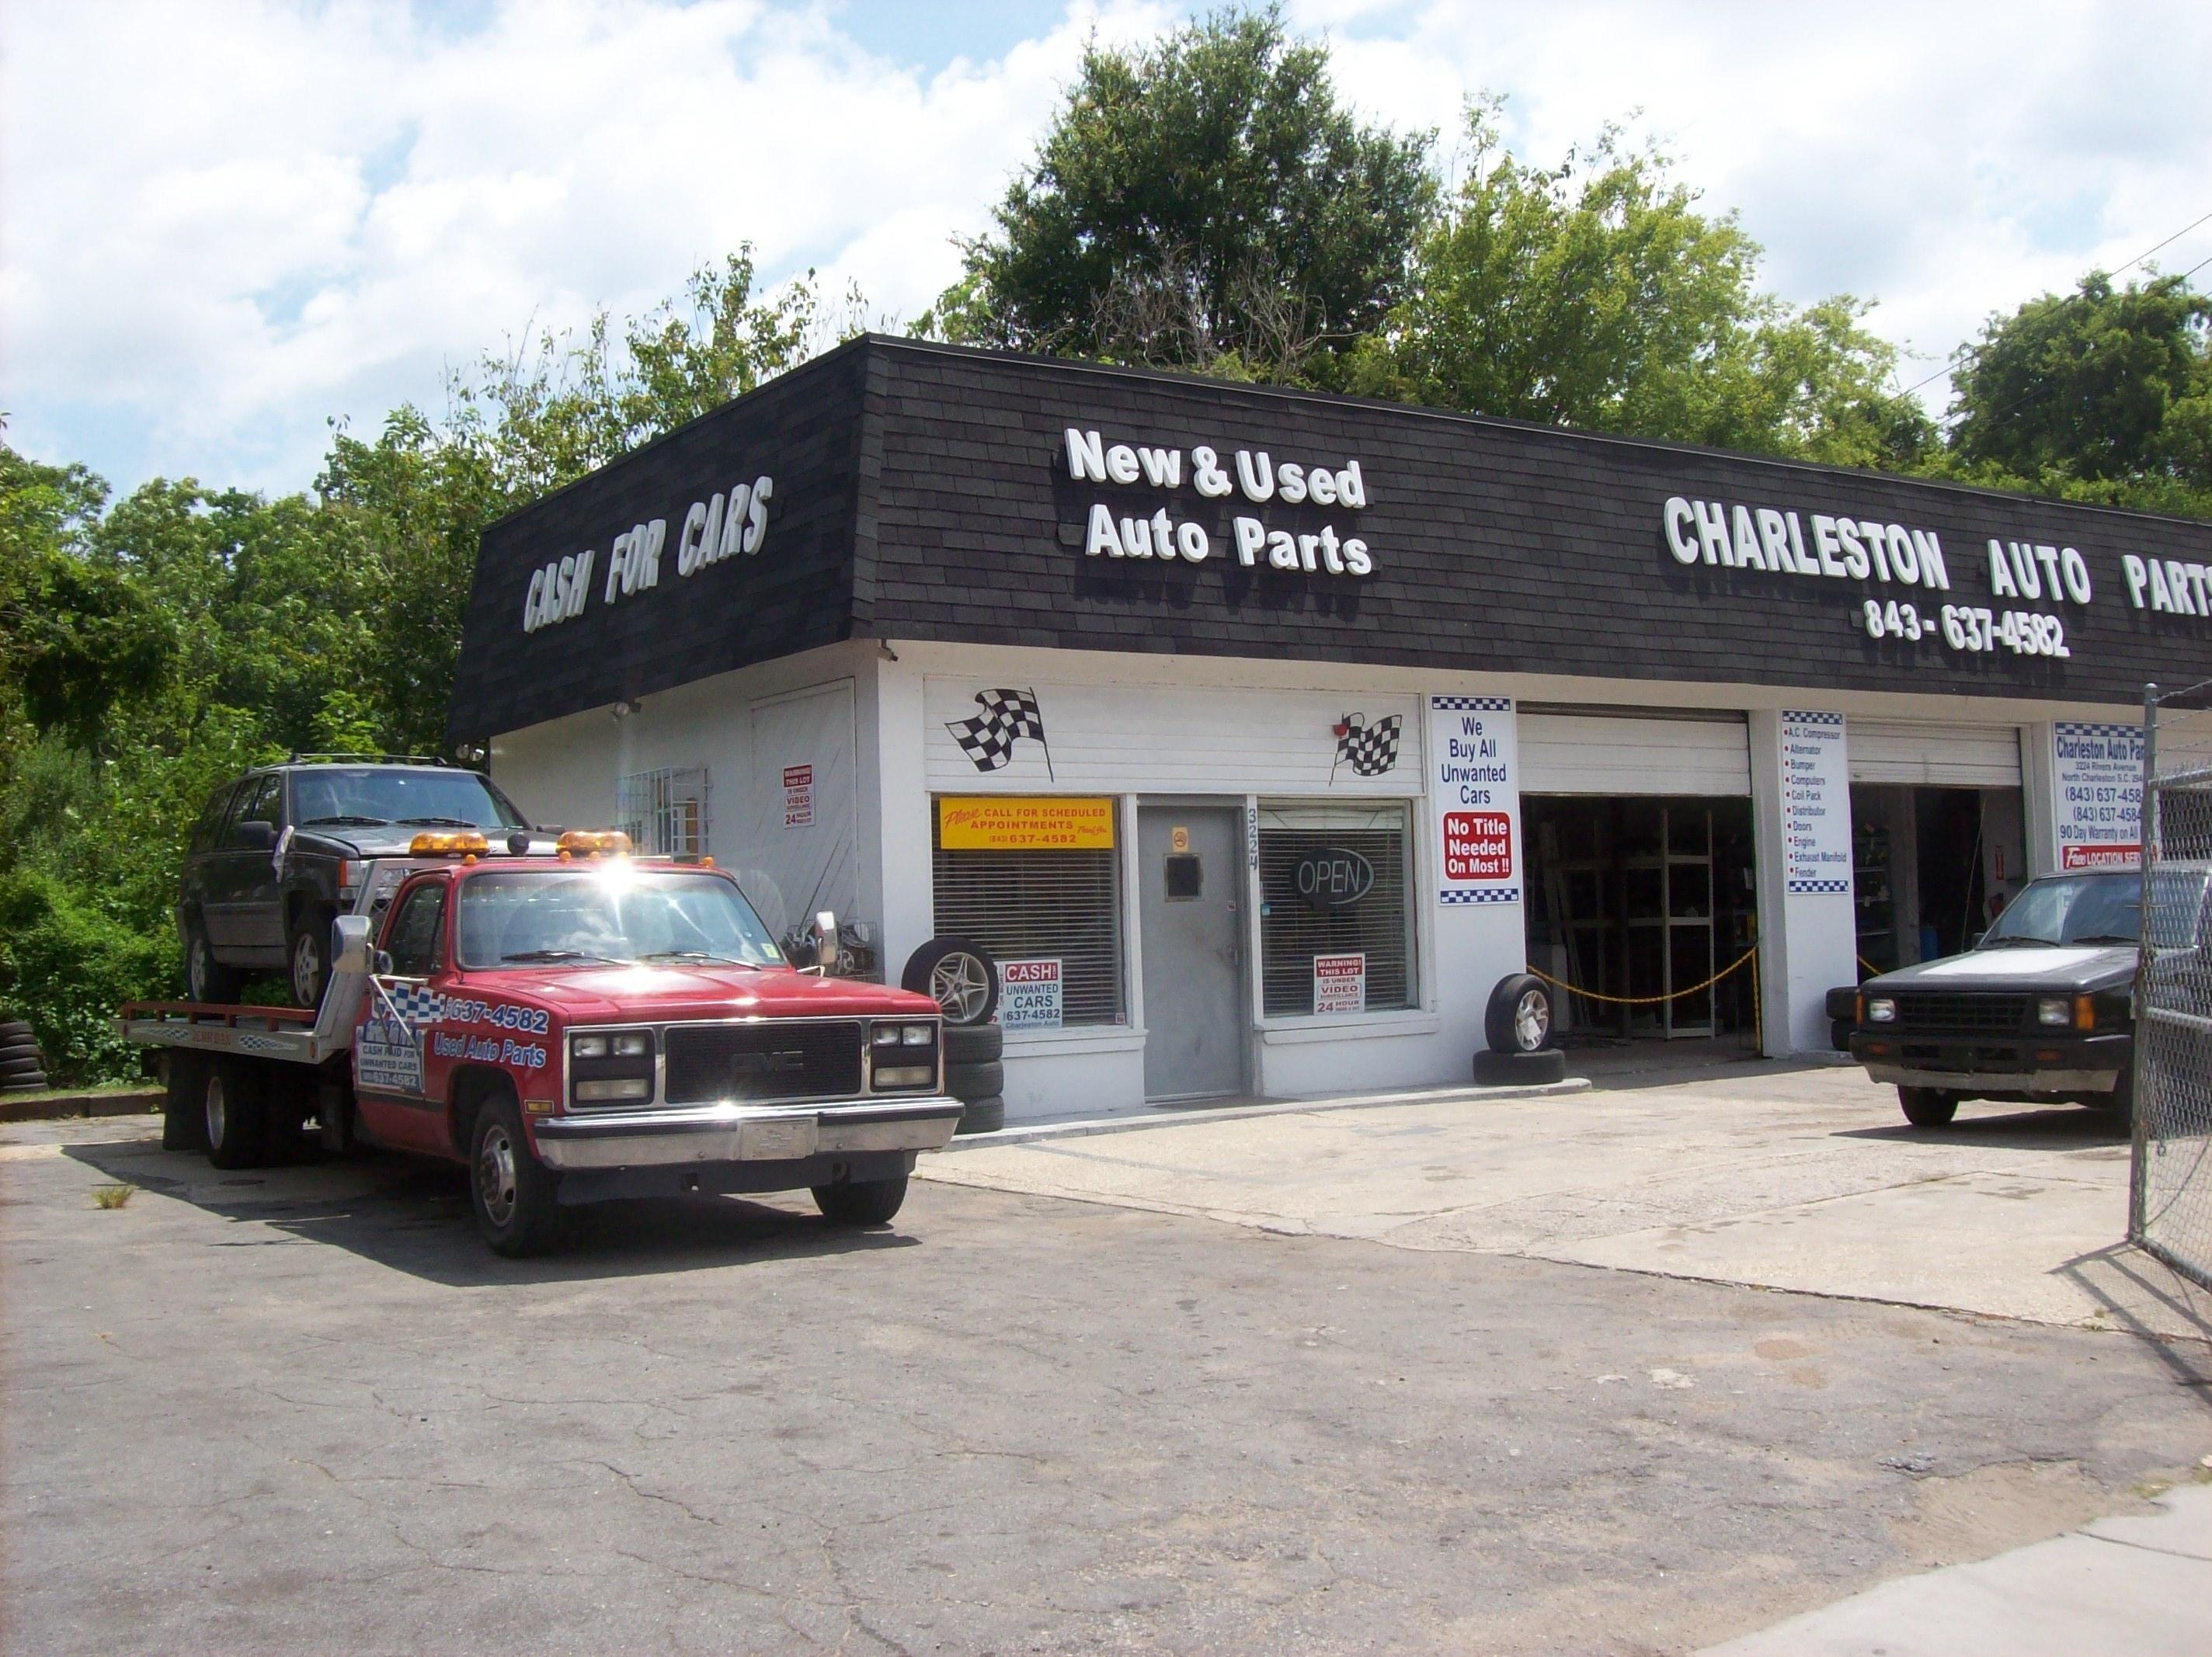 Charleston Auto Parts 3224 Rivers Ave, North Charleston, SC 29405 ...